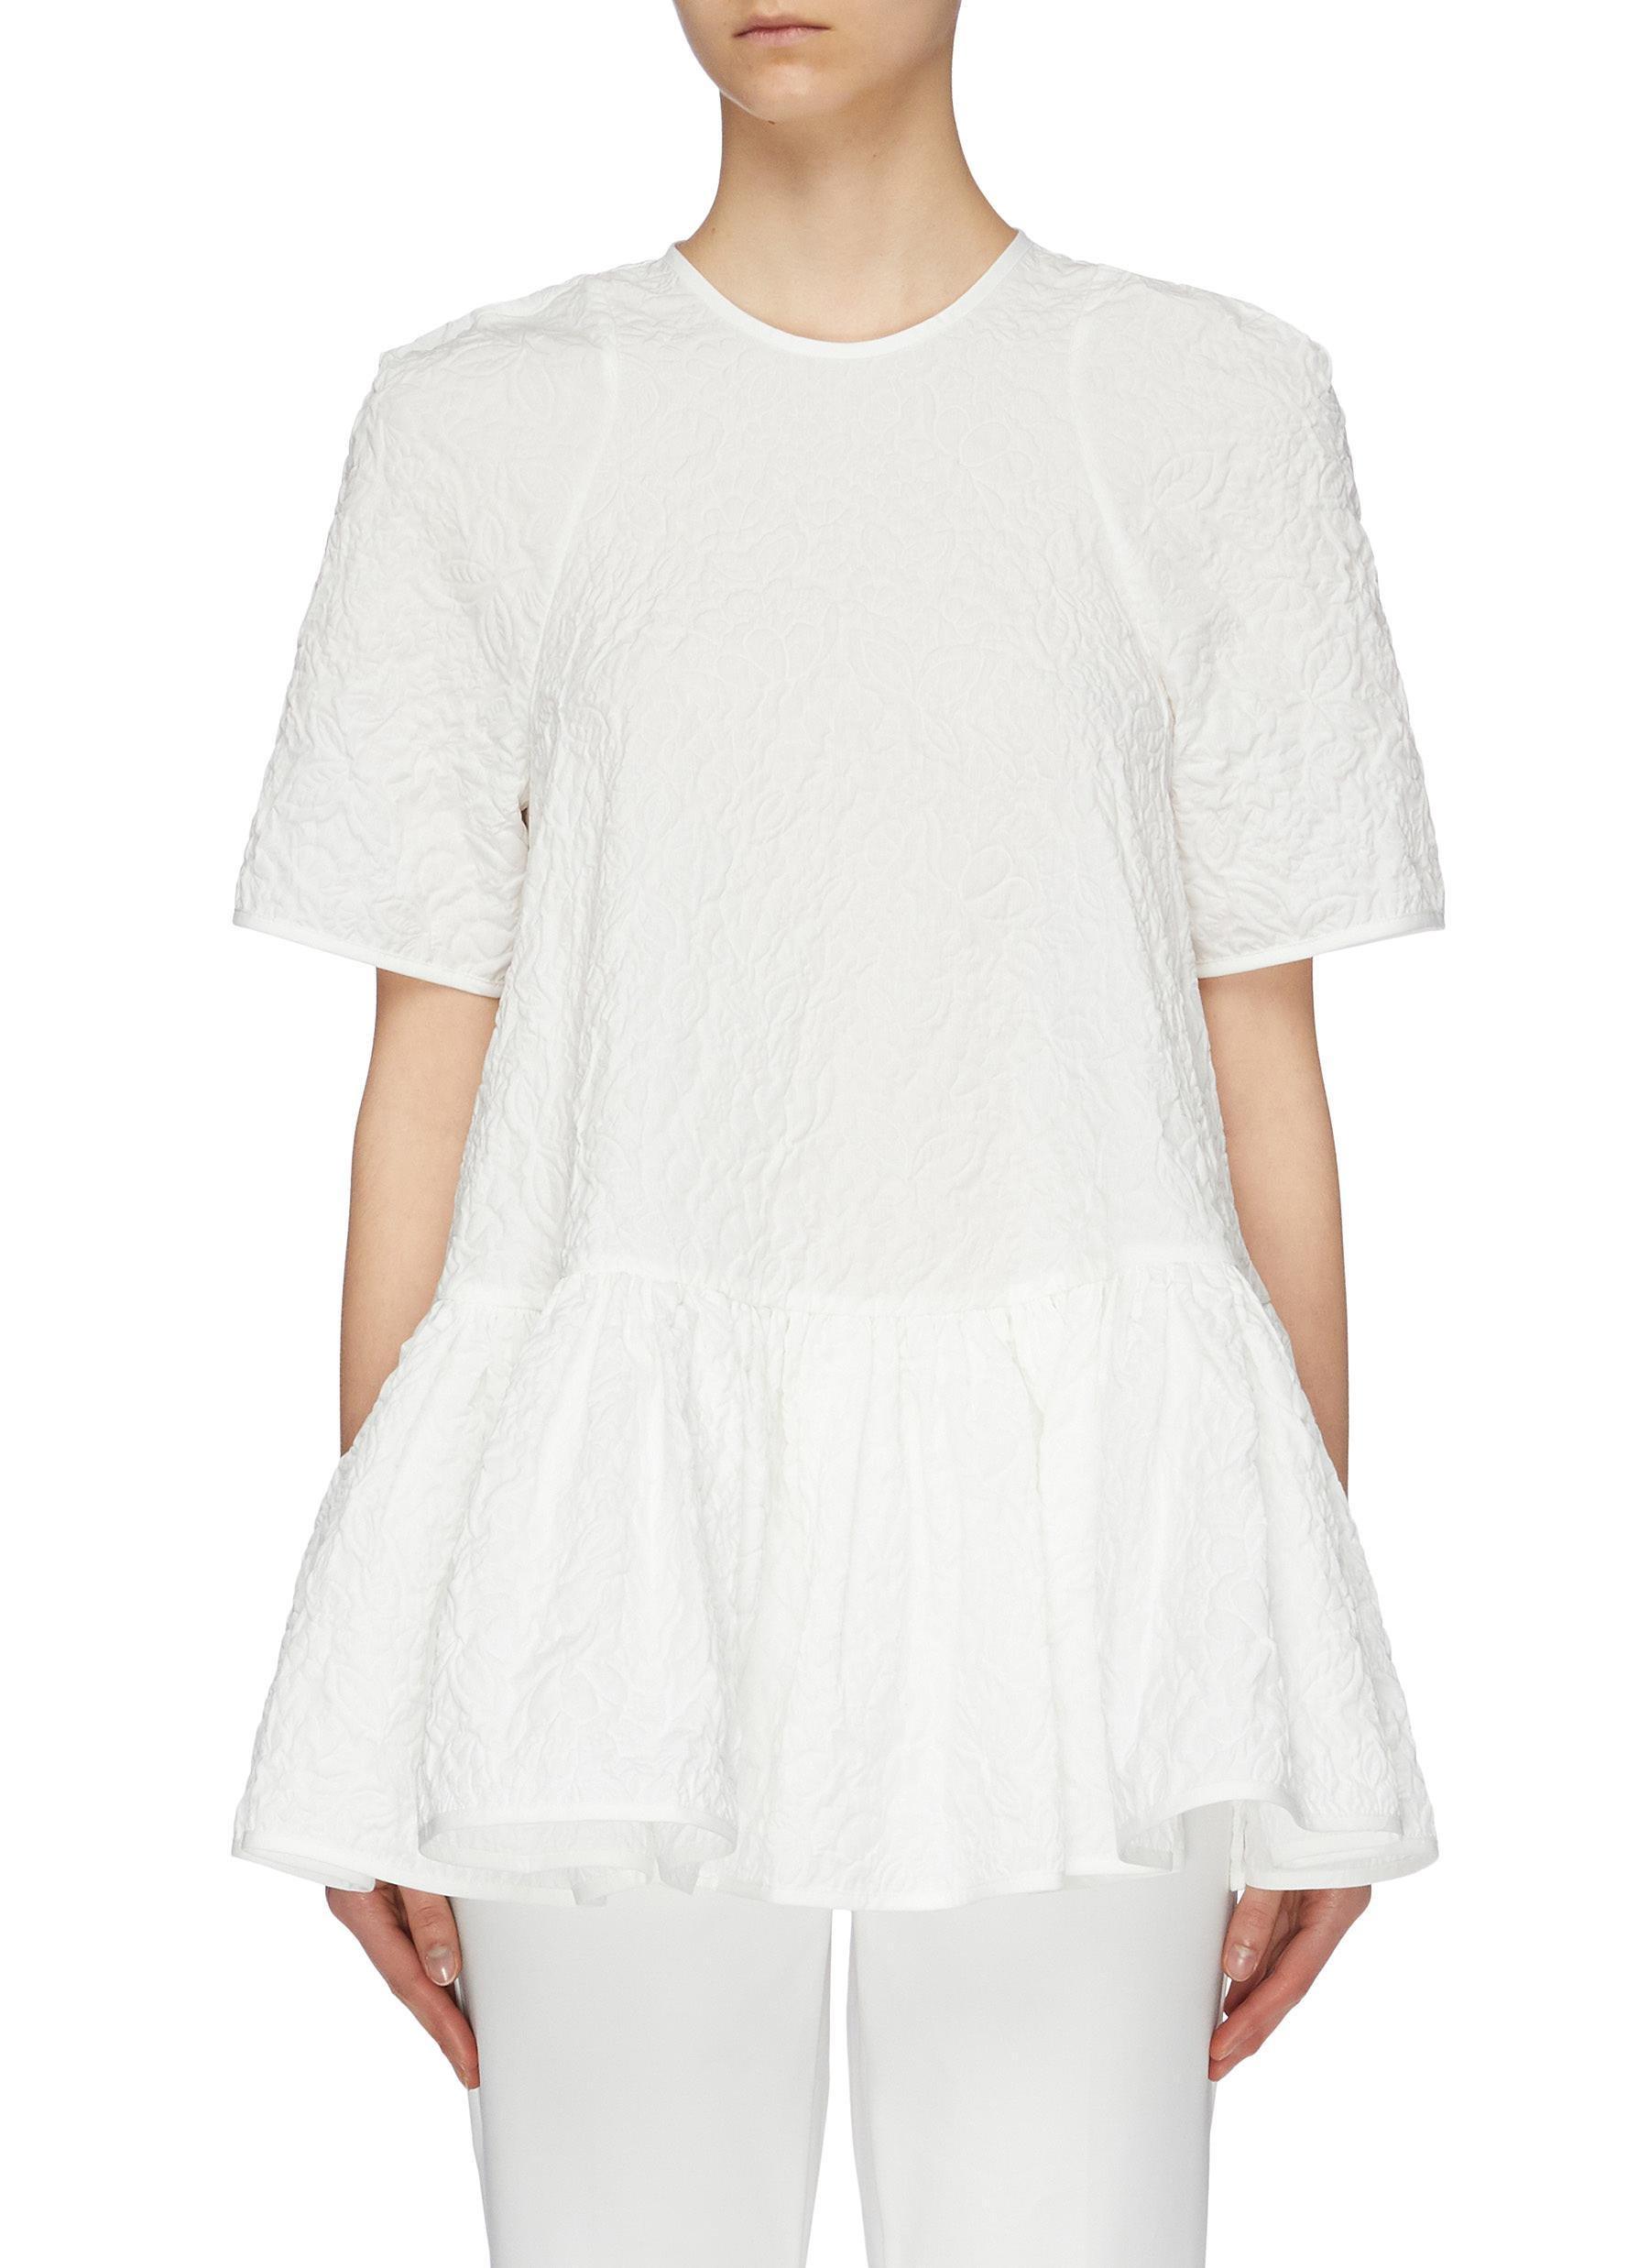 4c31de086ee917 Cecile Bahnsen. Women s White  susi  Tie Keyhole Back Brocade Peplum Top